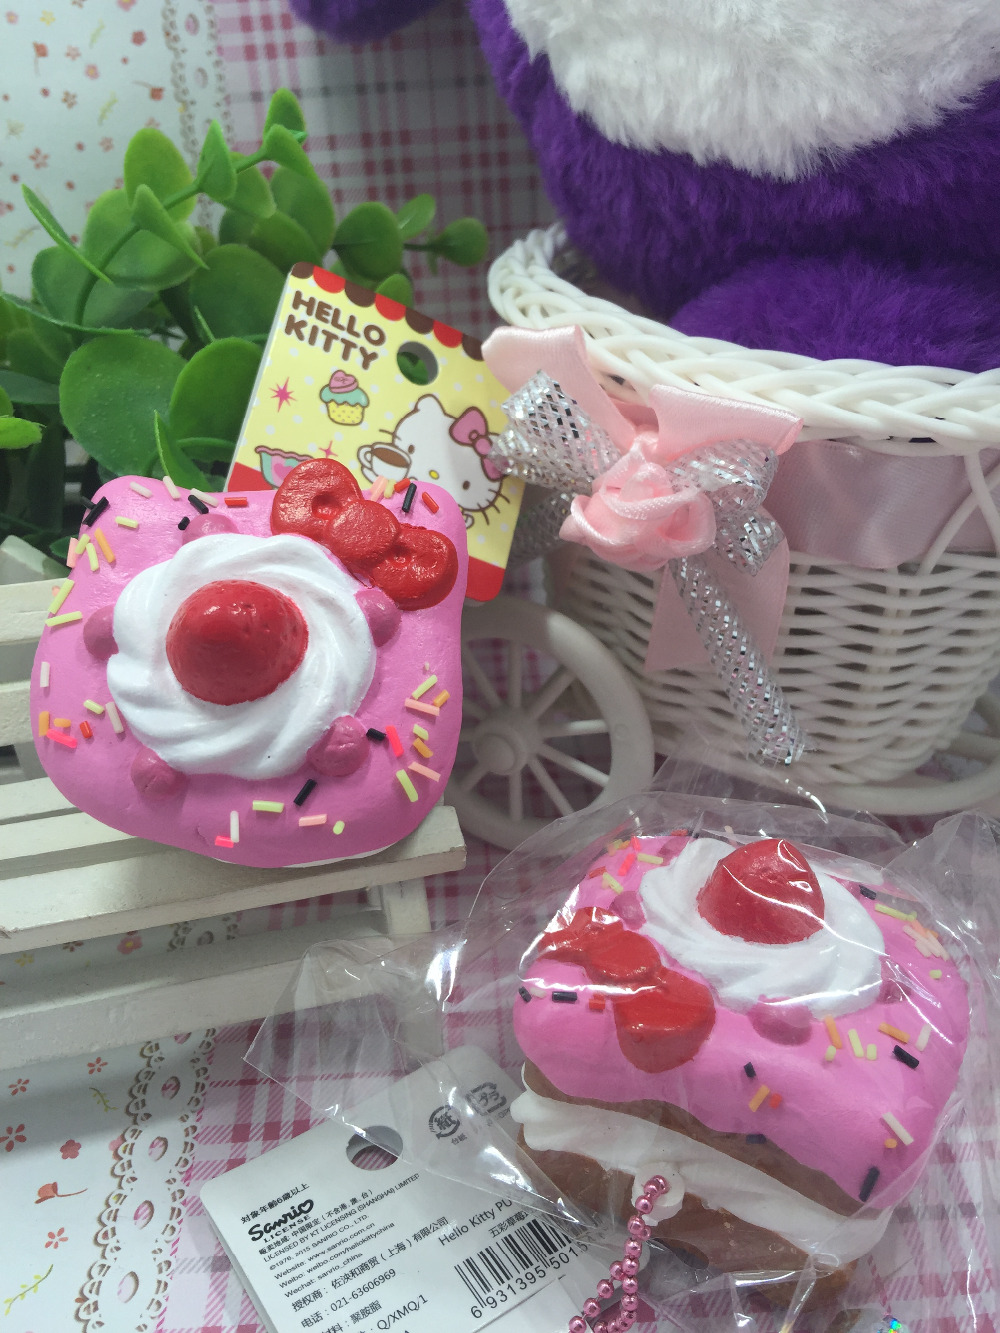 1PCS original package rare hello kitty squishy sweet cake squishy phone charm pink food toys stress